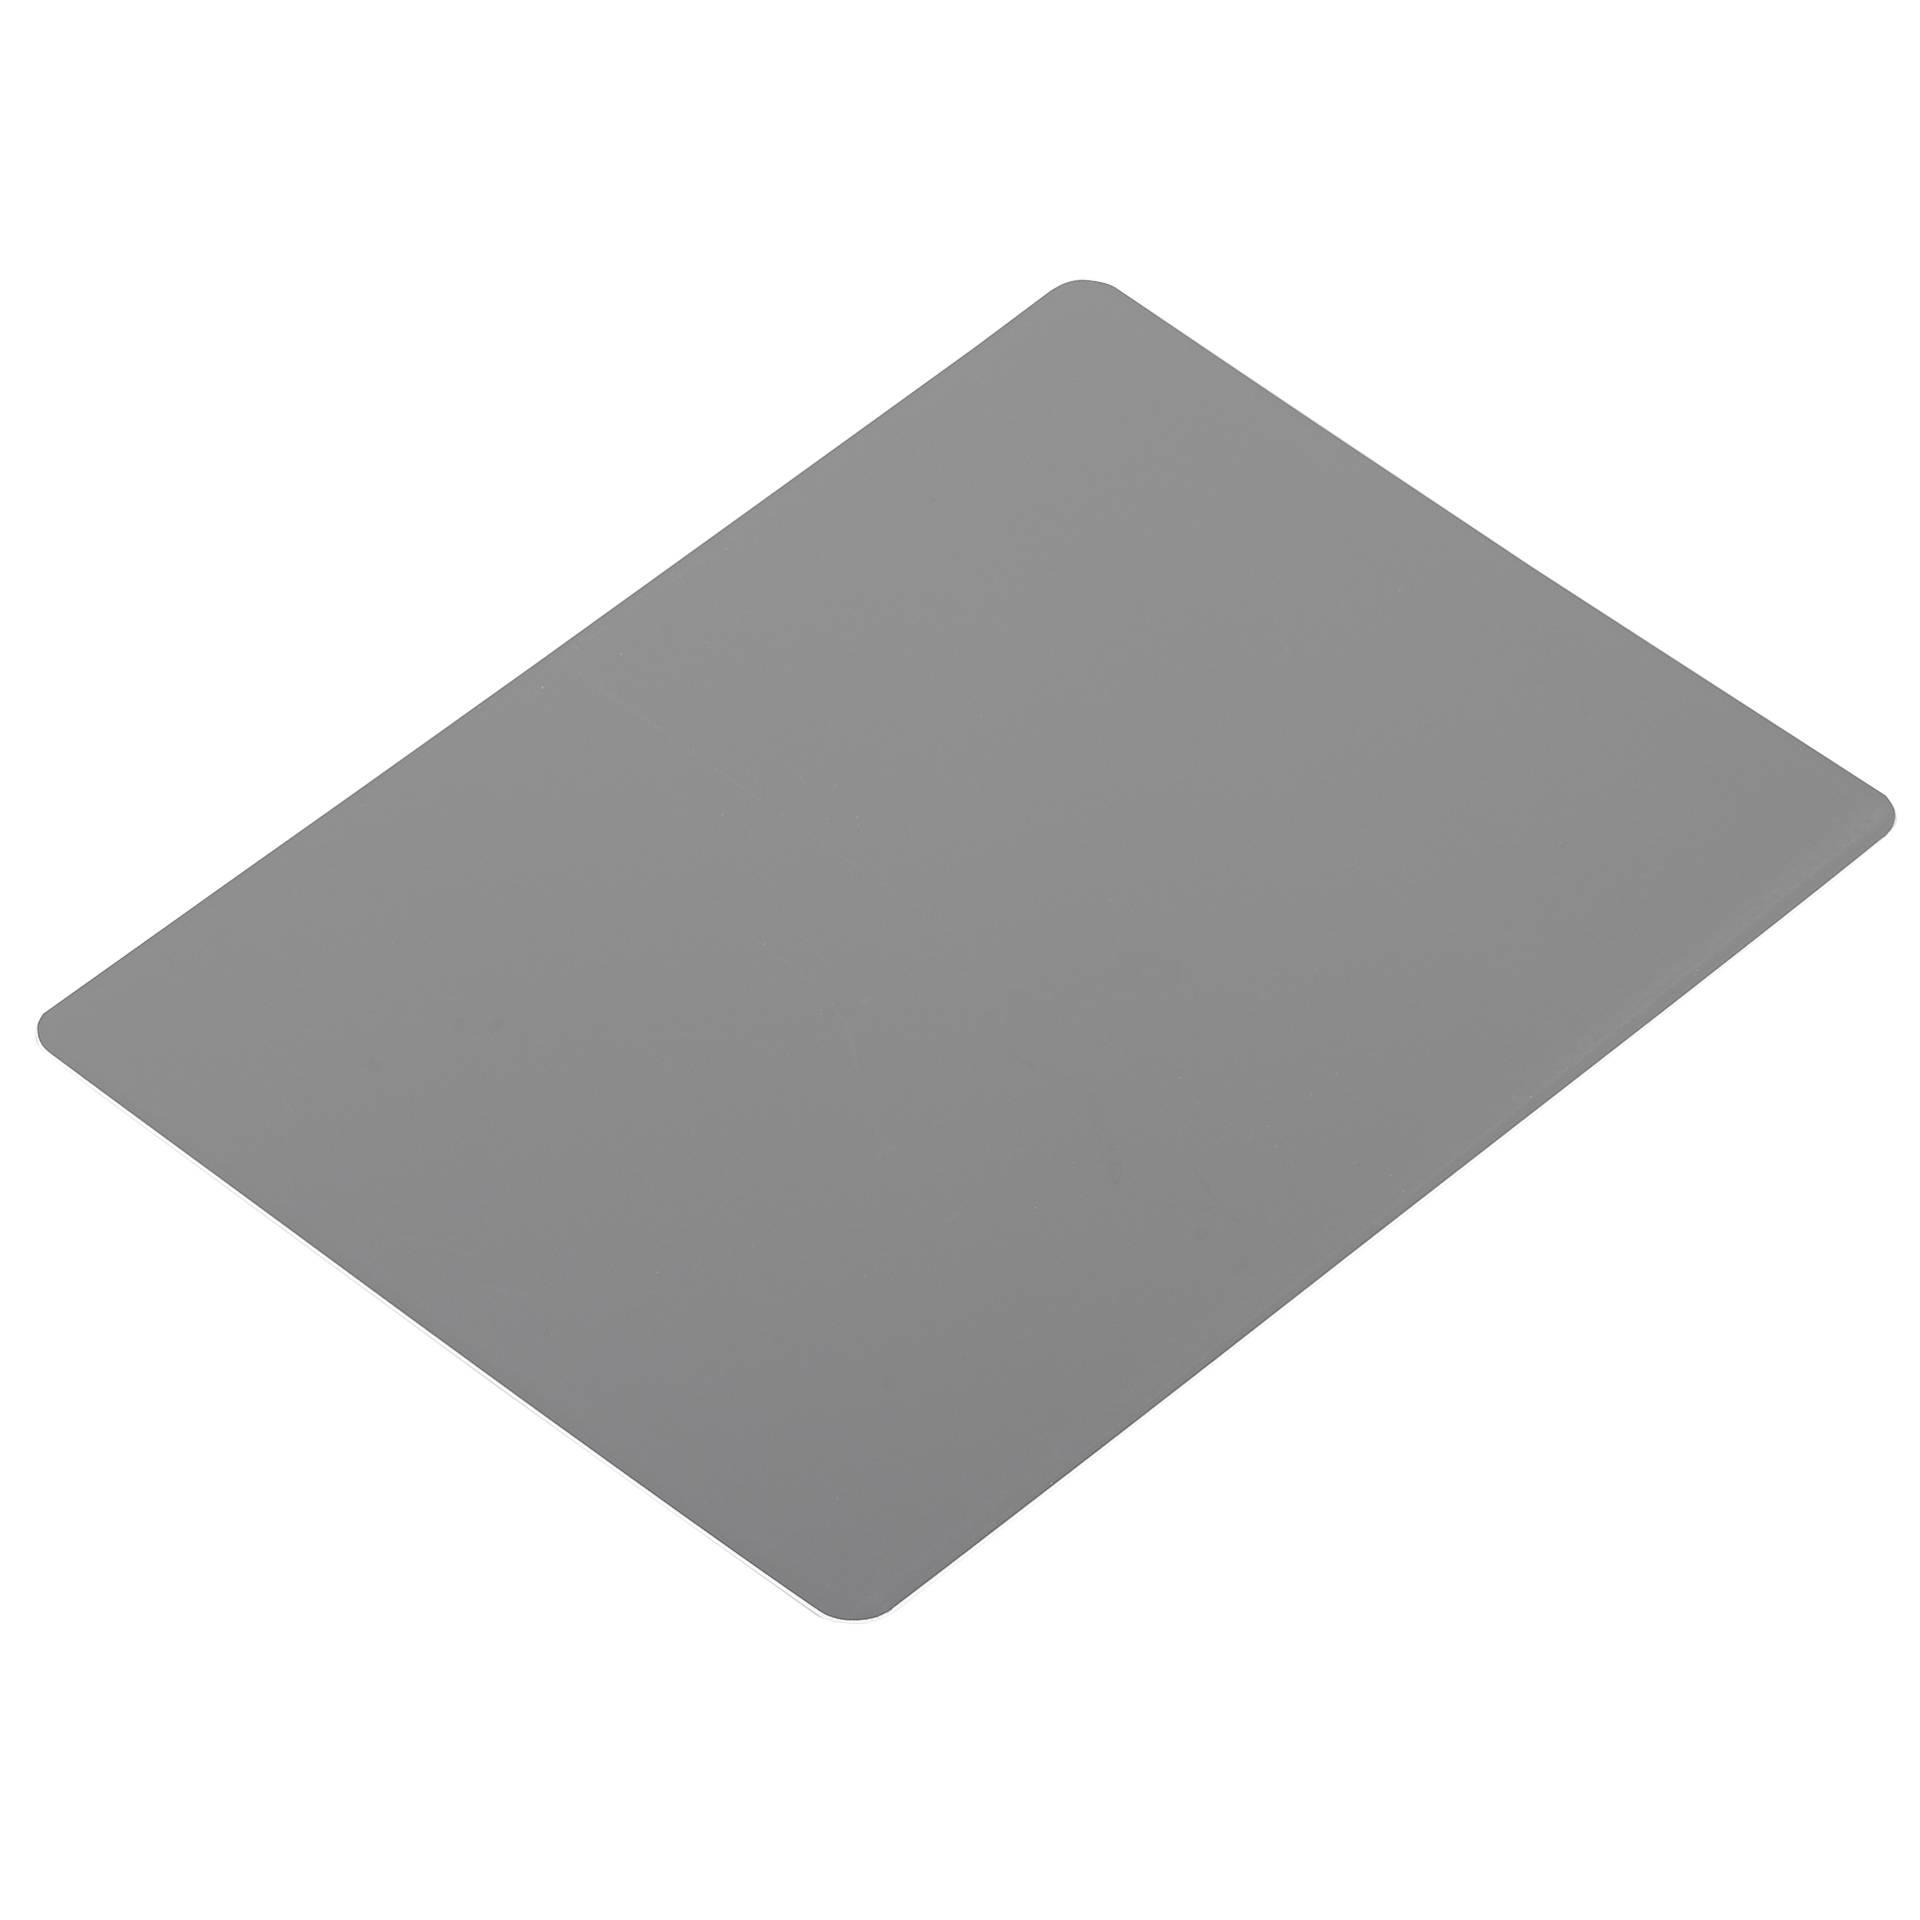 Novoflex Kontrollkarte ZEBRA grau / weiss 15 x 20 cm